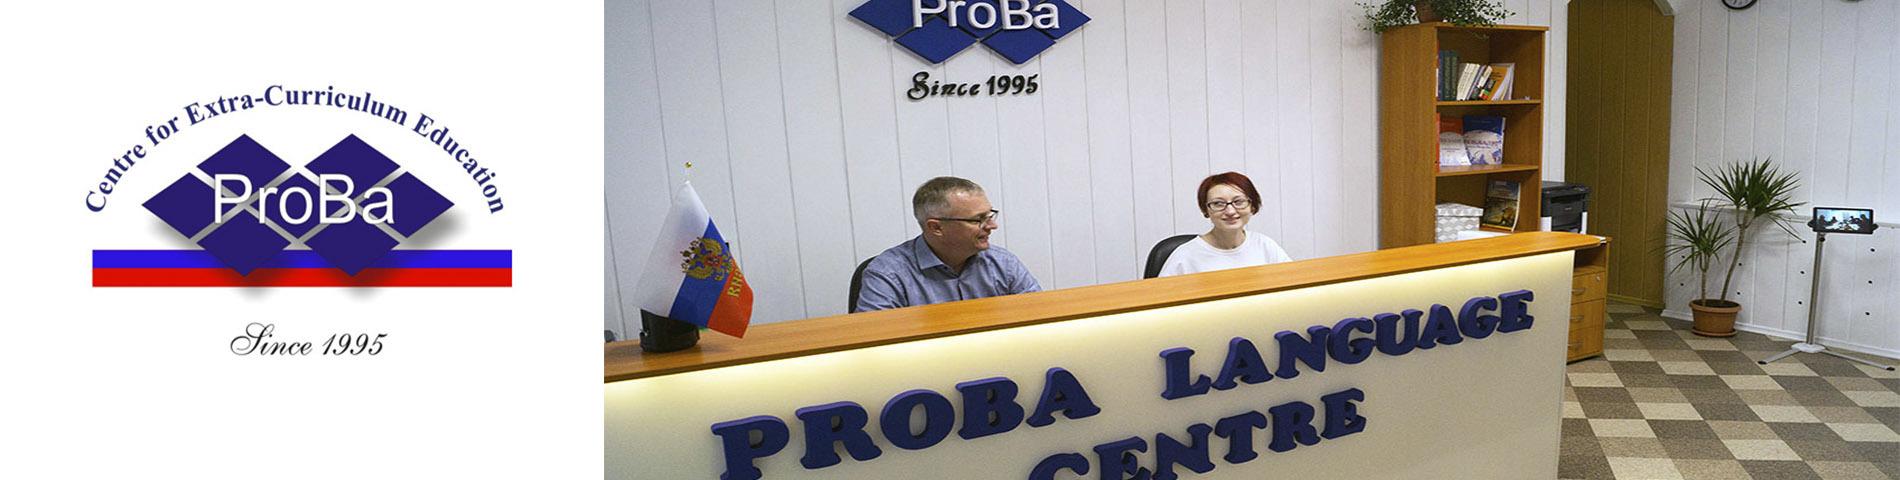 ProBa Educational Centre صورة 1